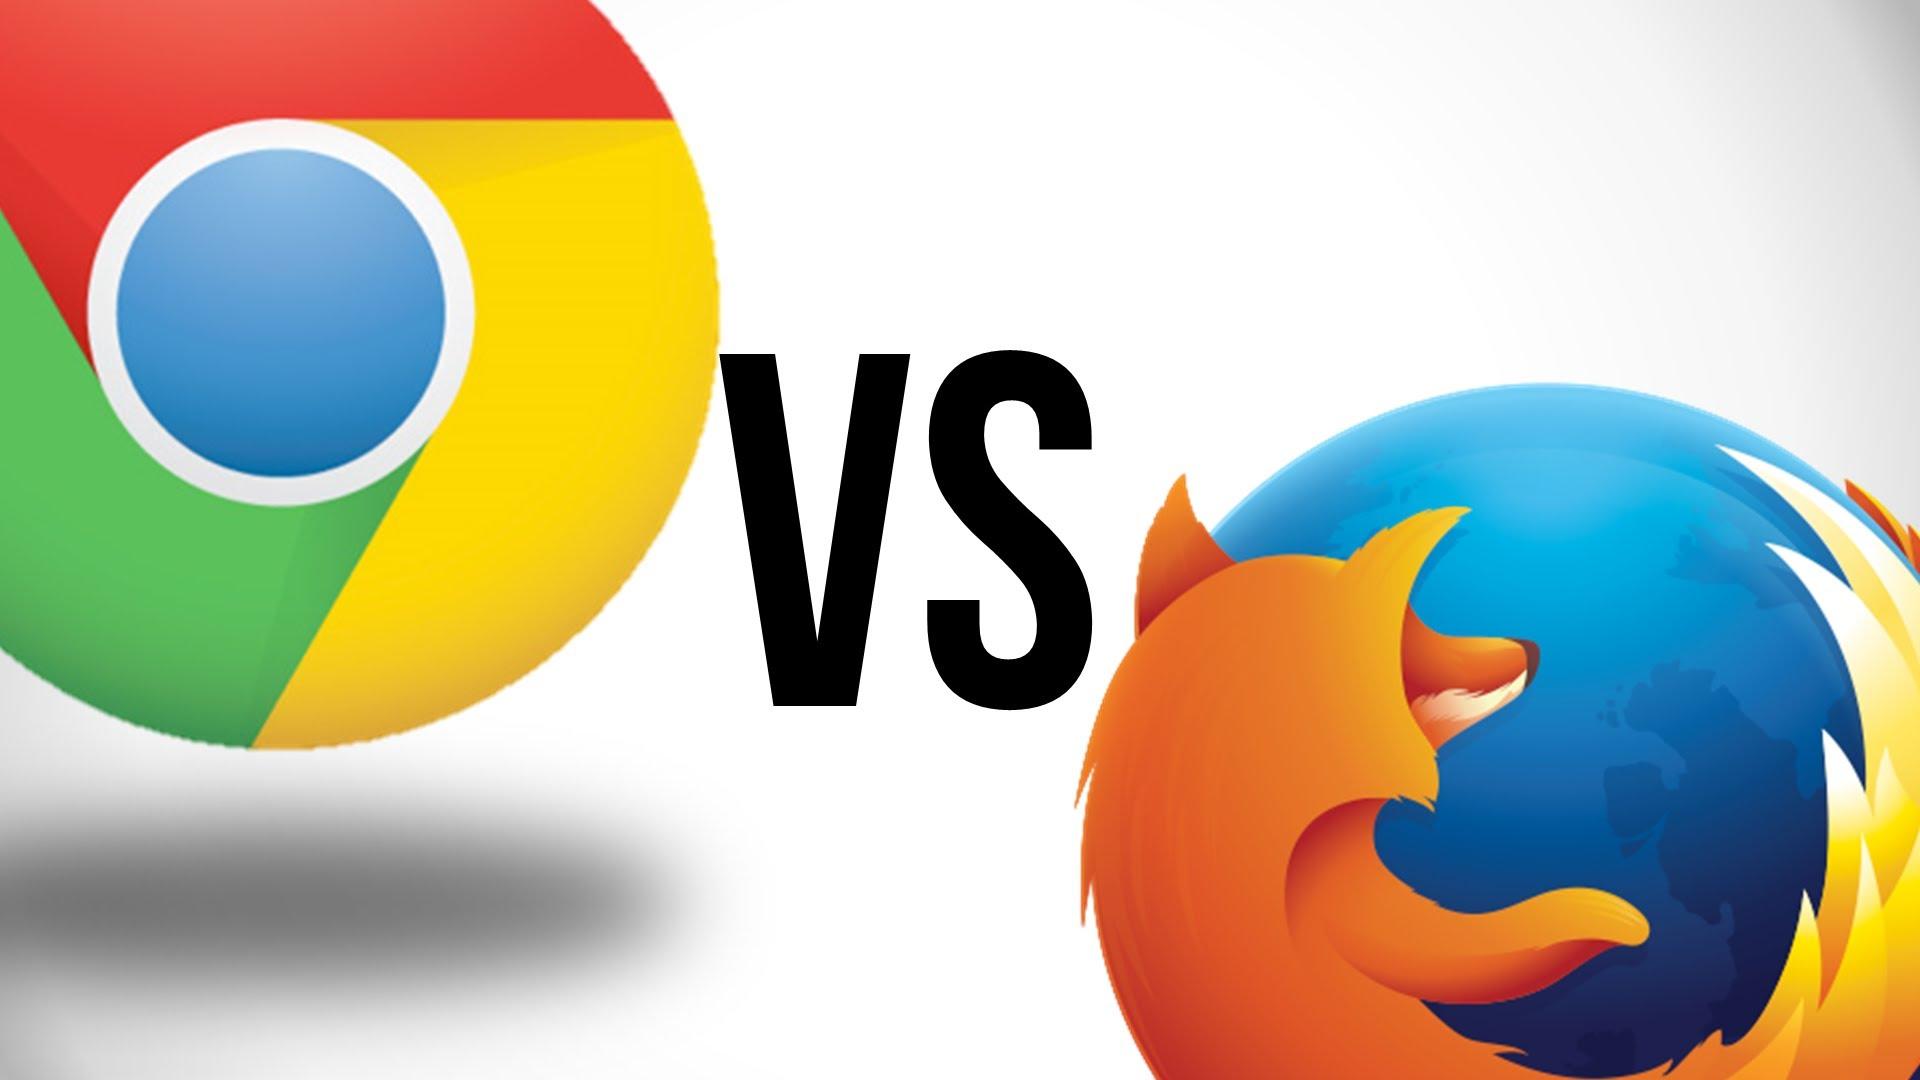 Firefox le pega a Chrome donde más le duele   El Imparcial de Oaxaca